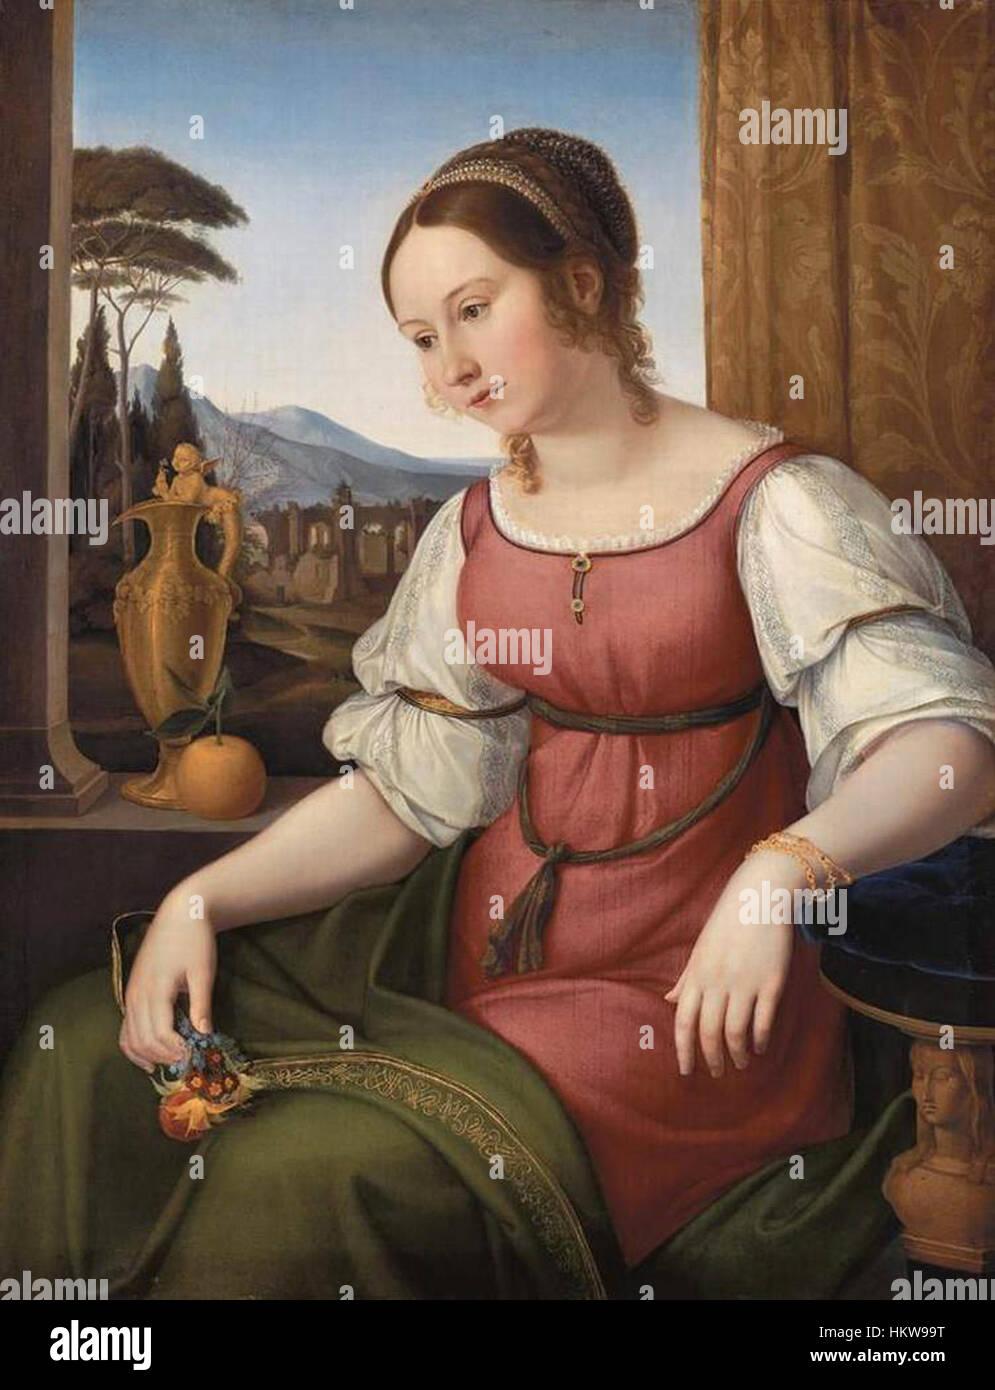 Friedrich Wilhelm von Schadow - Portrait d'une jeune femme romaine (Angelina) Magtti - WGA20938 Banque D'Images